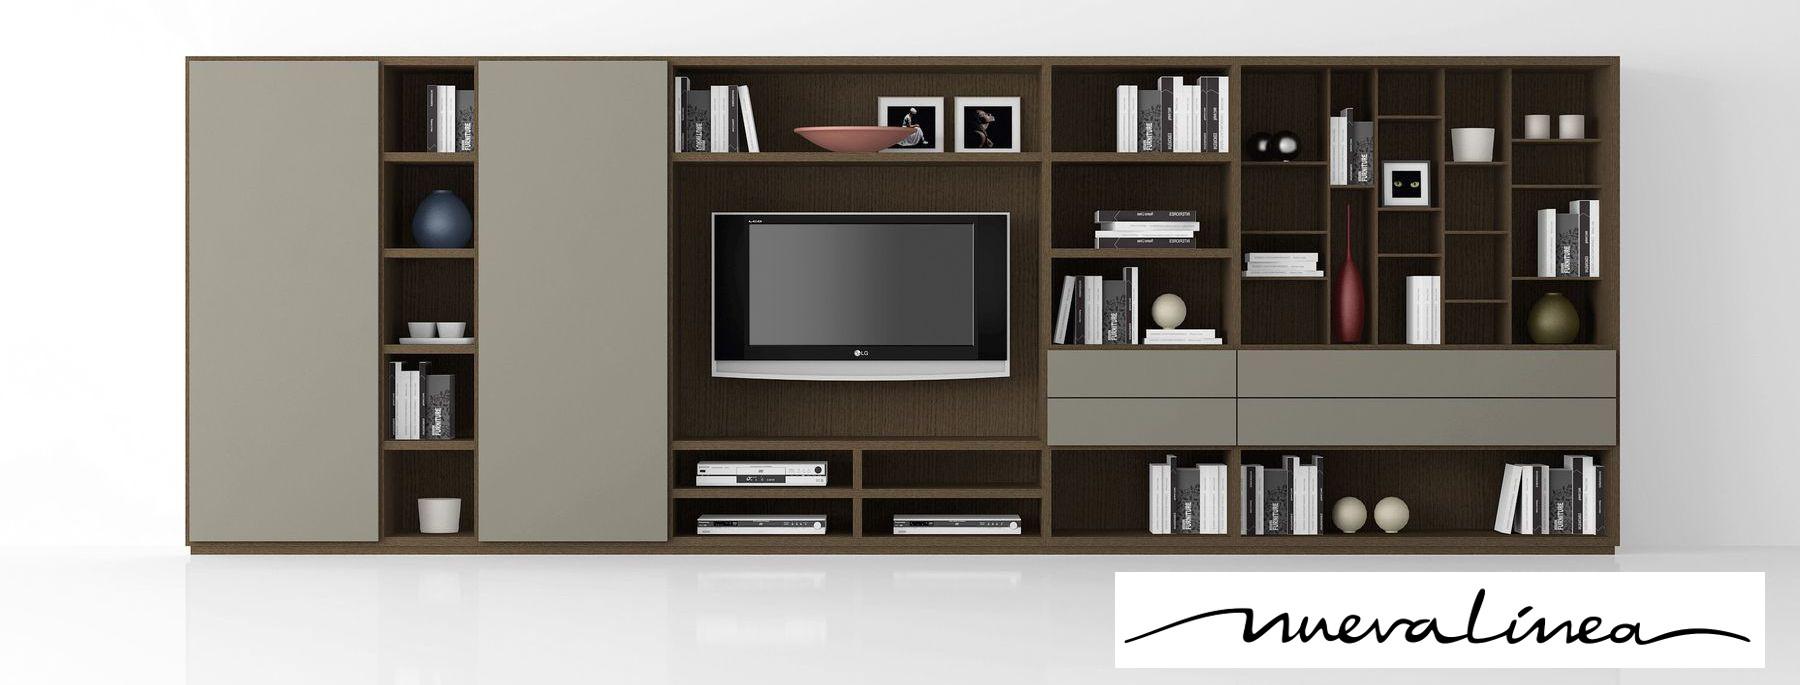 Promociones de muebles y l mparas de dise o en madrid for Muebles diseno outlet online